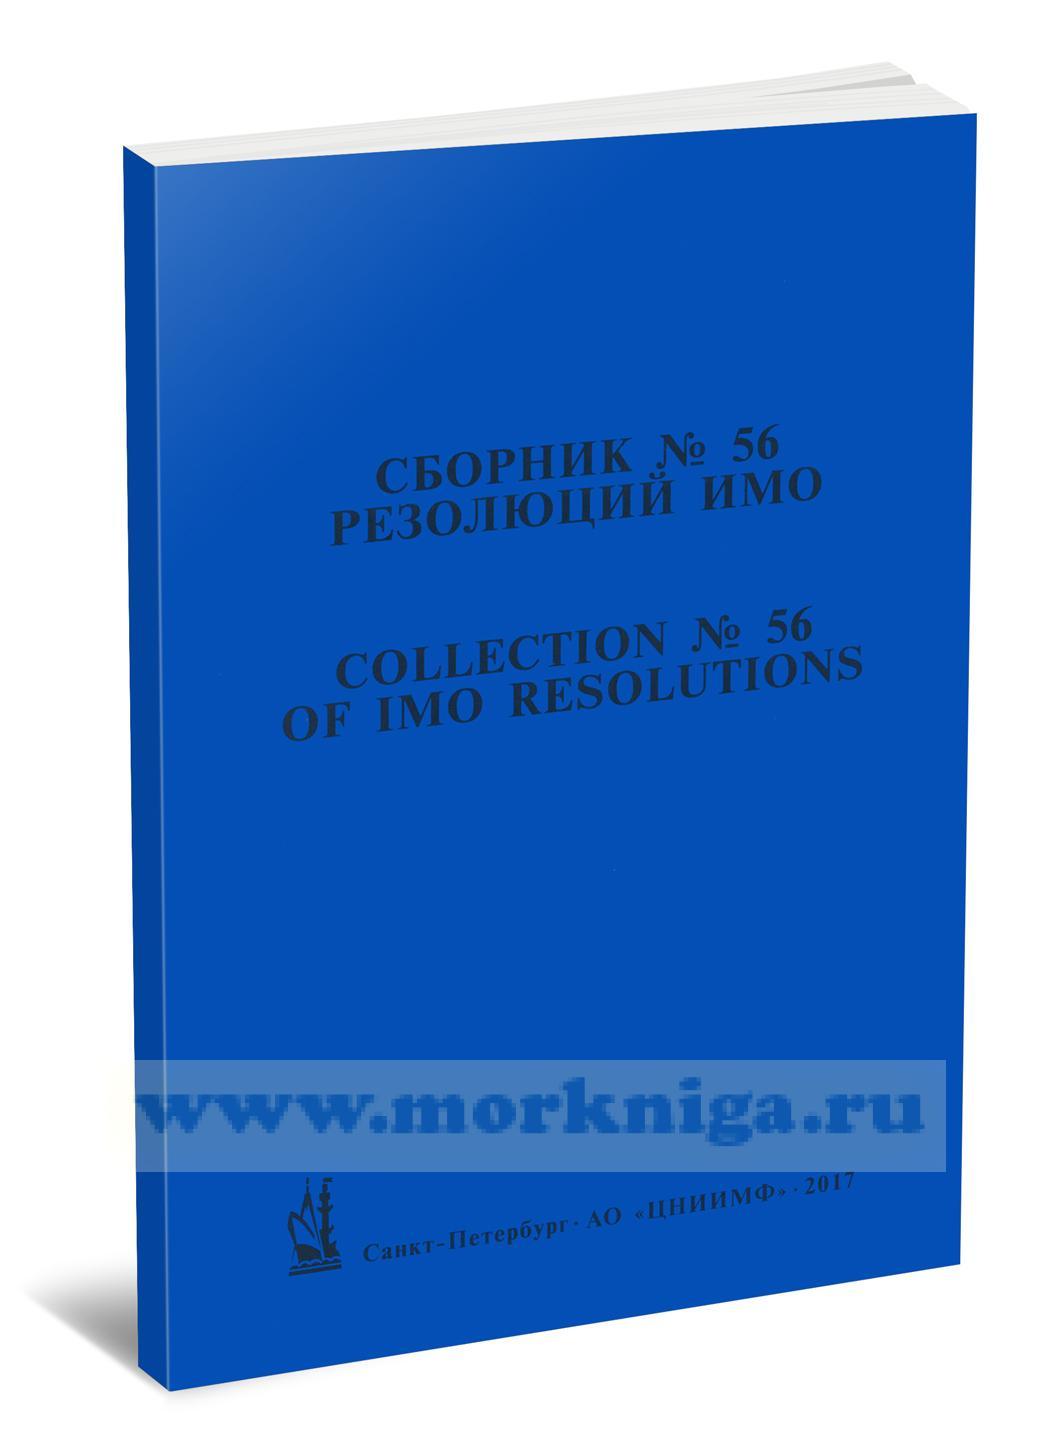 Сборник № 56 резолюций ИМО/ Collection No.56 of IMO Resolutions